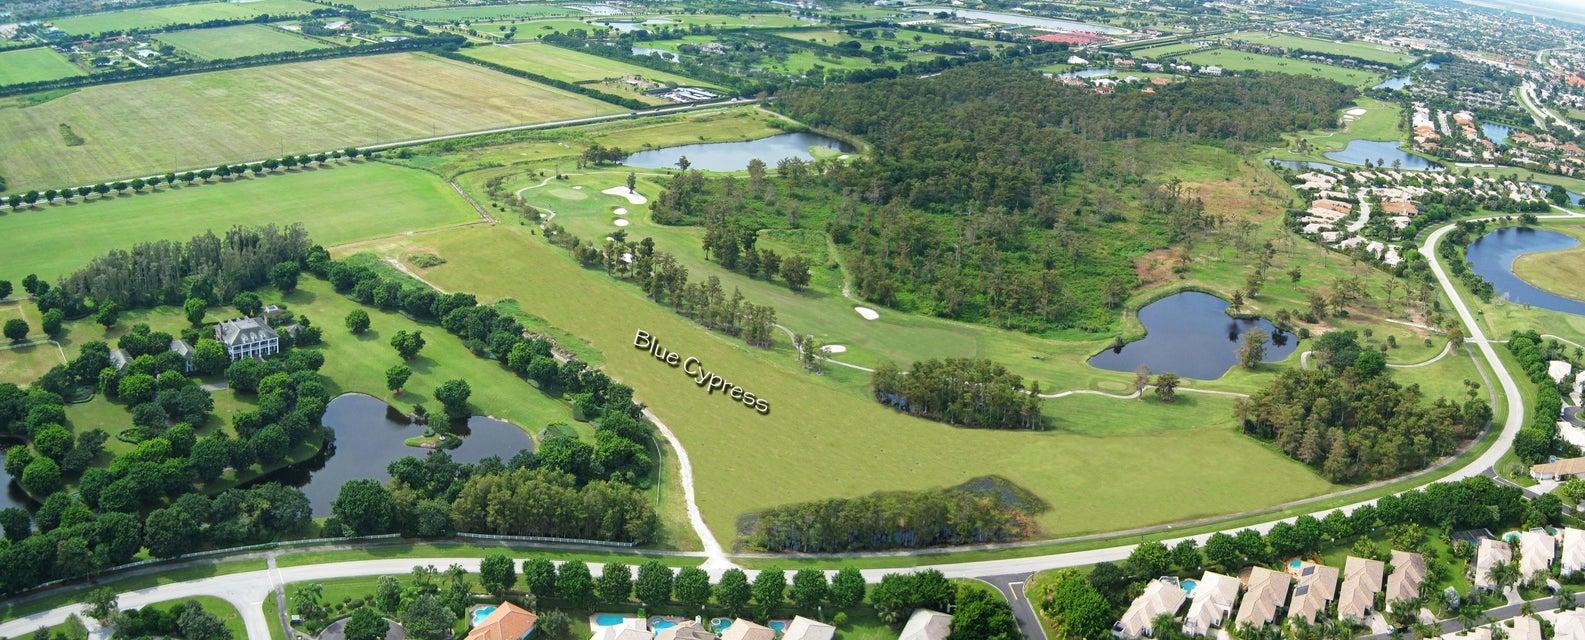 Single Family Home for Sale at 3157 Blue Cypress Lane 3157 Blue Cypress Lane Wellington, Florida 33414 United States